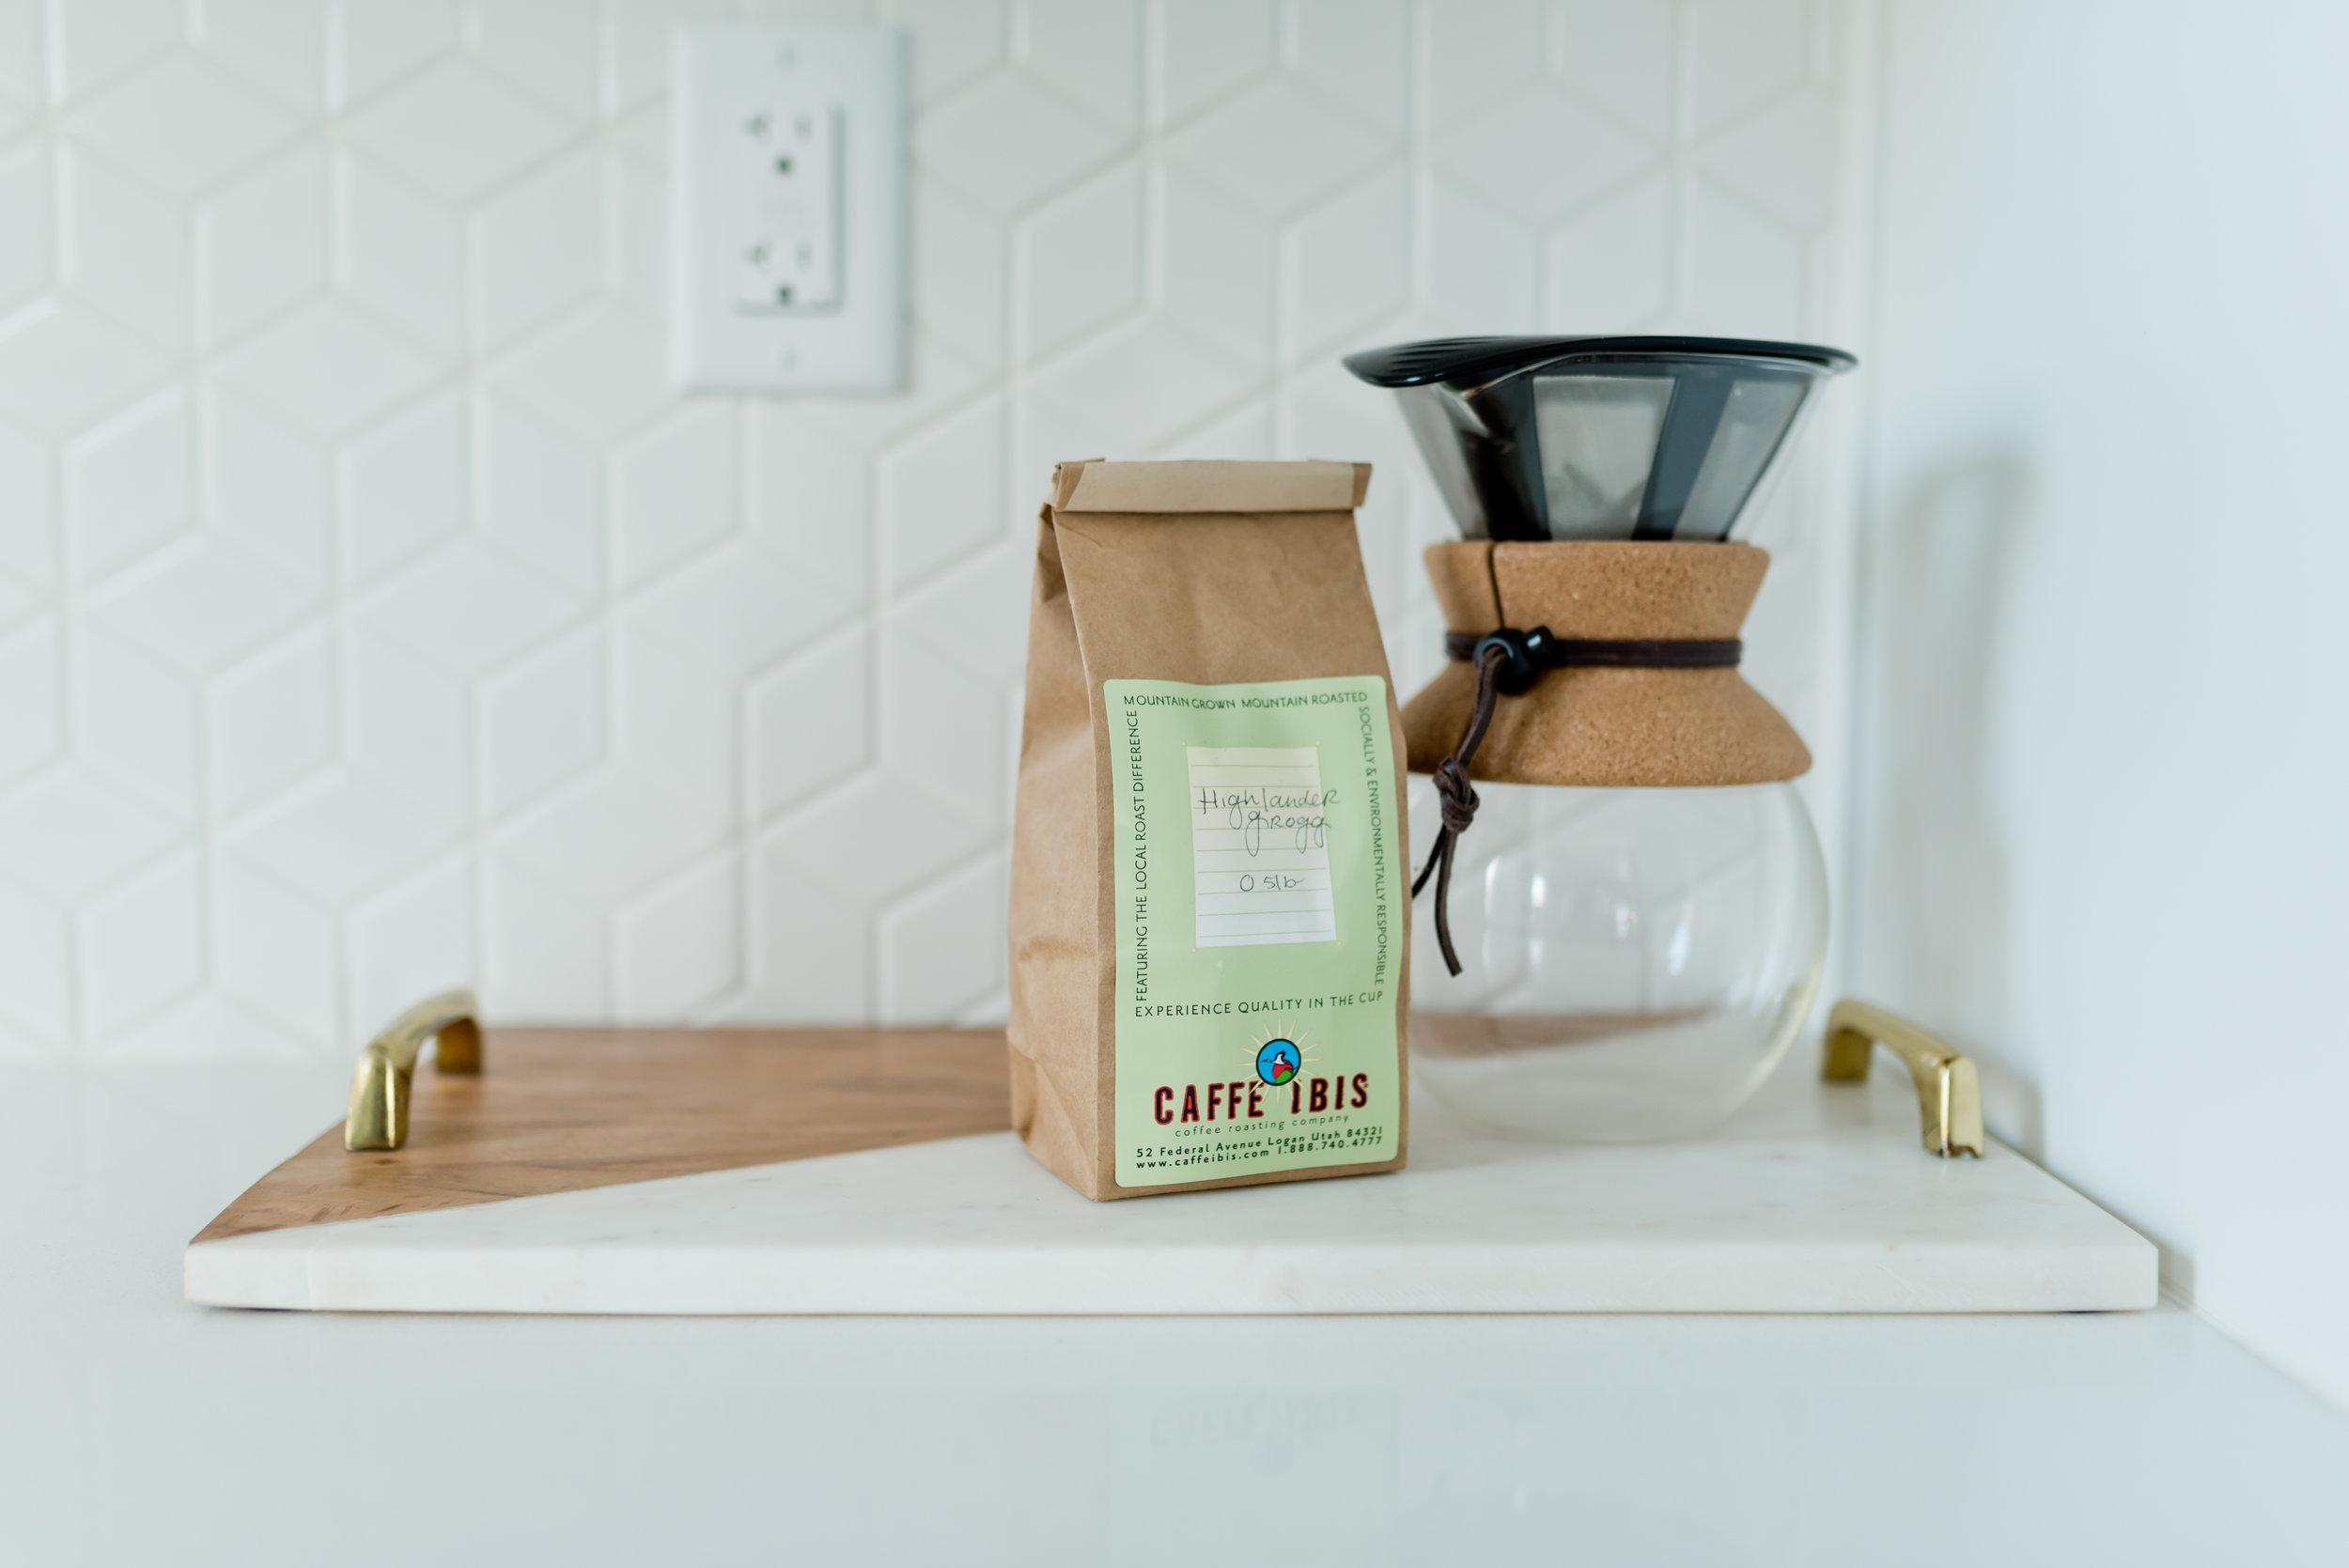 Fresh Cafe Ibis Coffee, drinks & treats